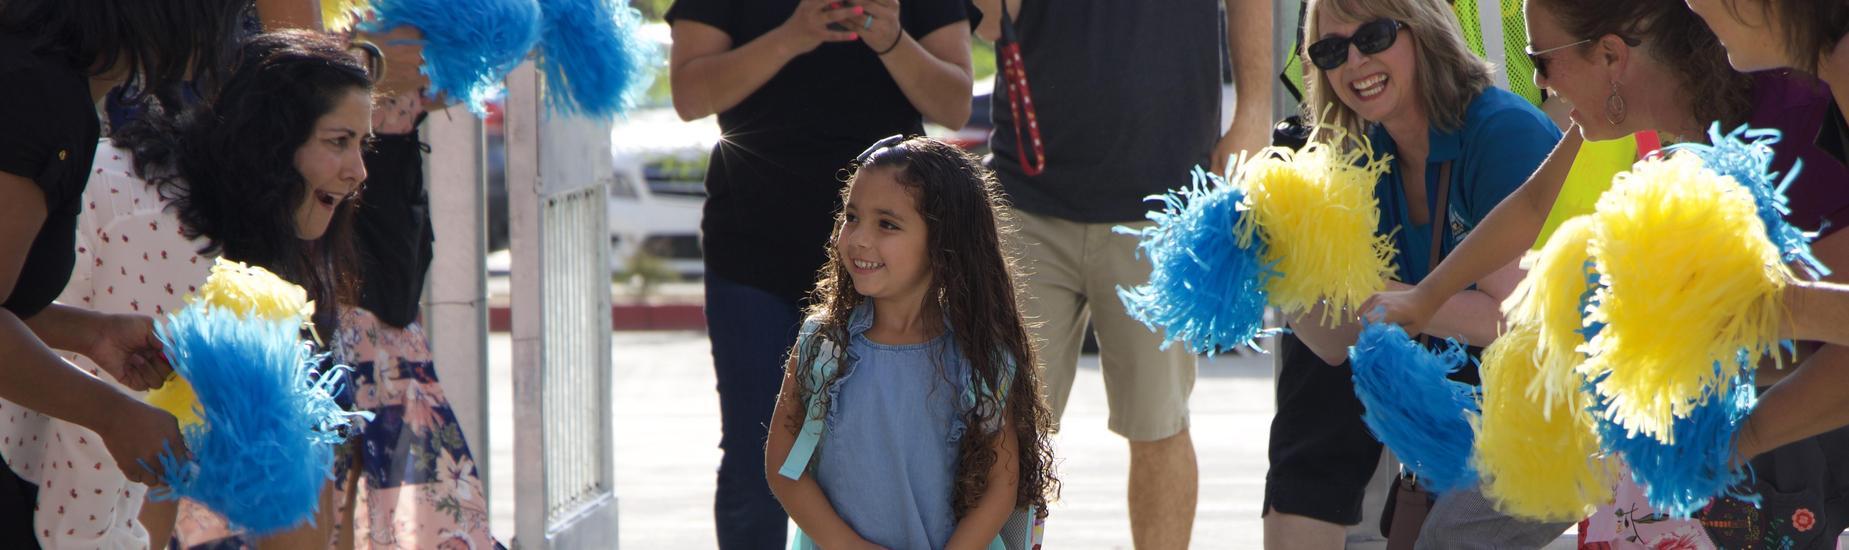 Little Girl Walking. Teachers cheering with pom poms